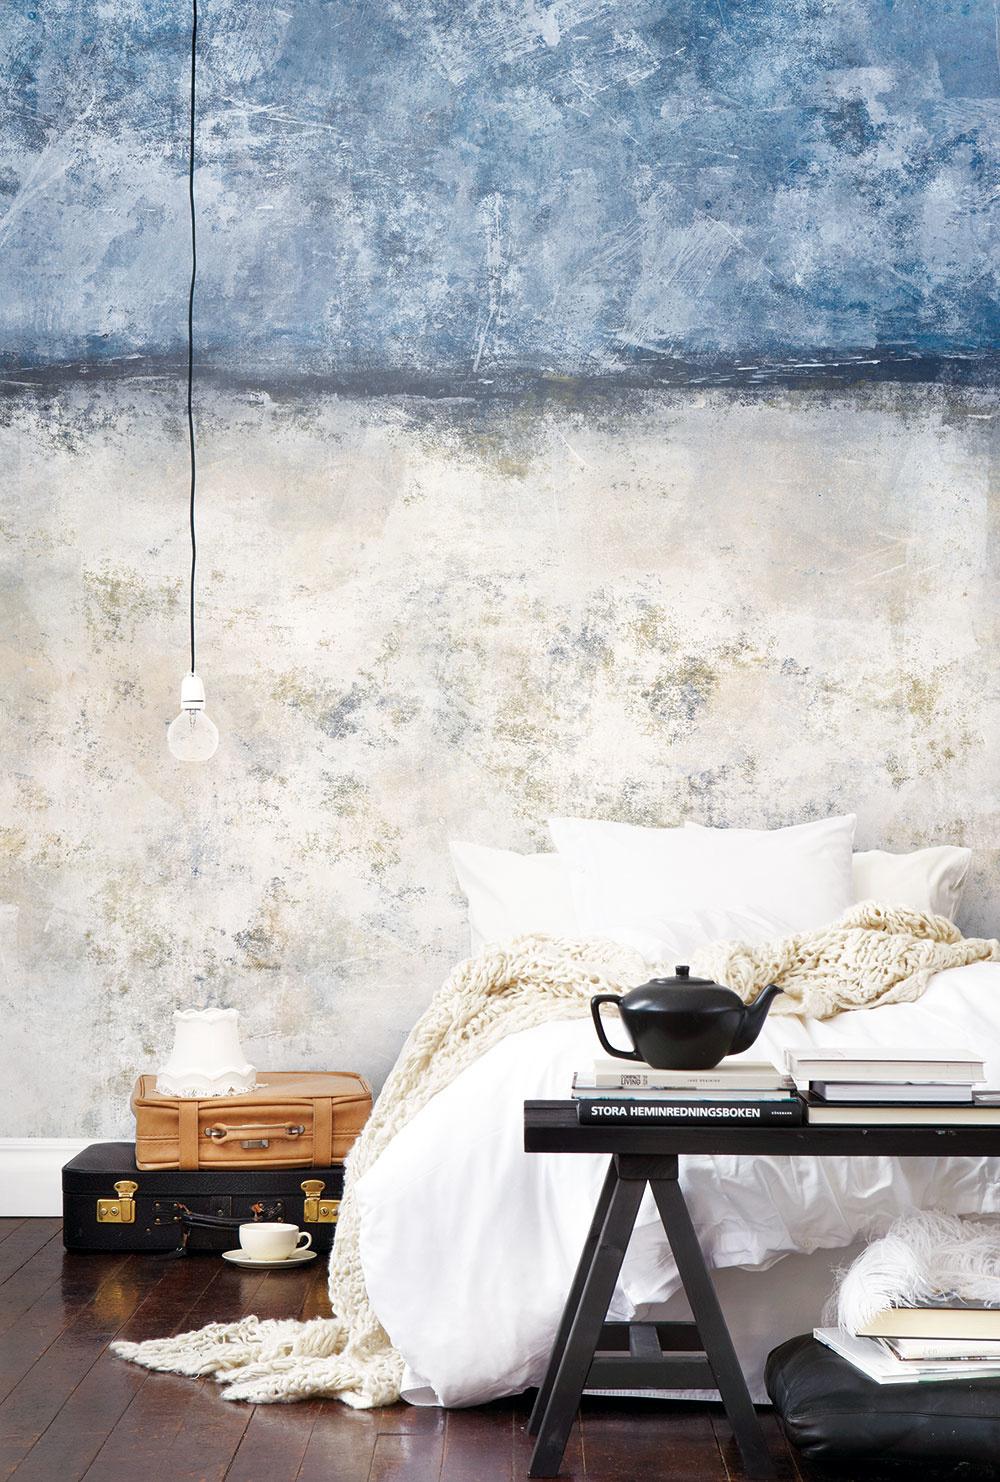 Vliesová tapeta Wallpainting od Mr Perswall, 180 × 265 cm, 132,84 €, www.design-shop.sk